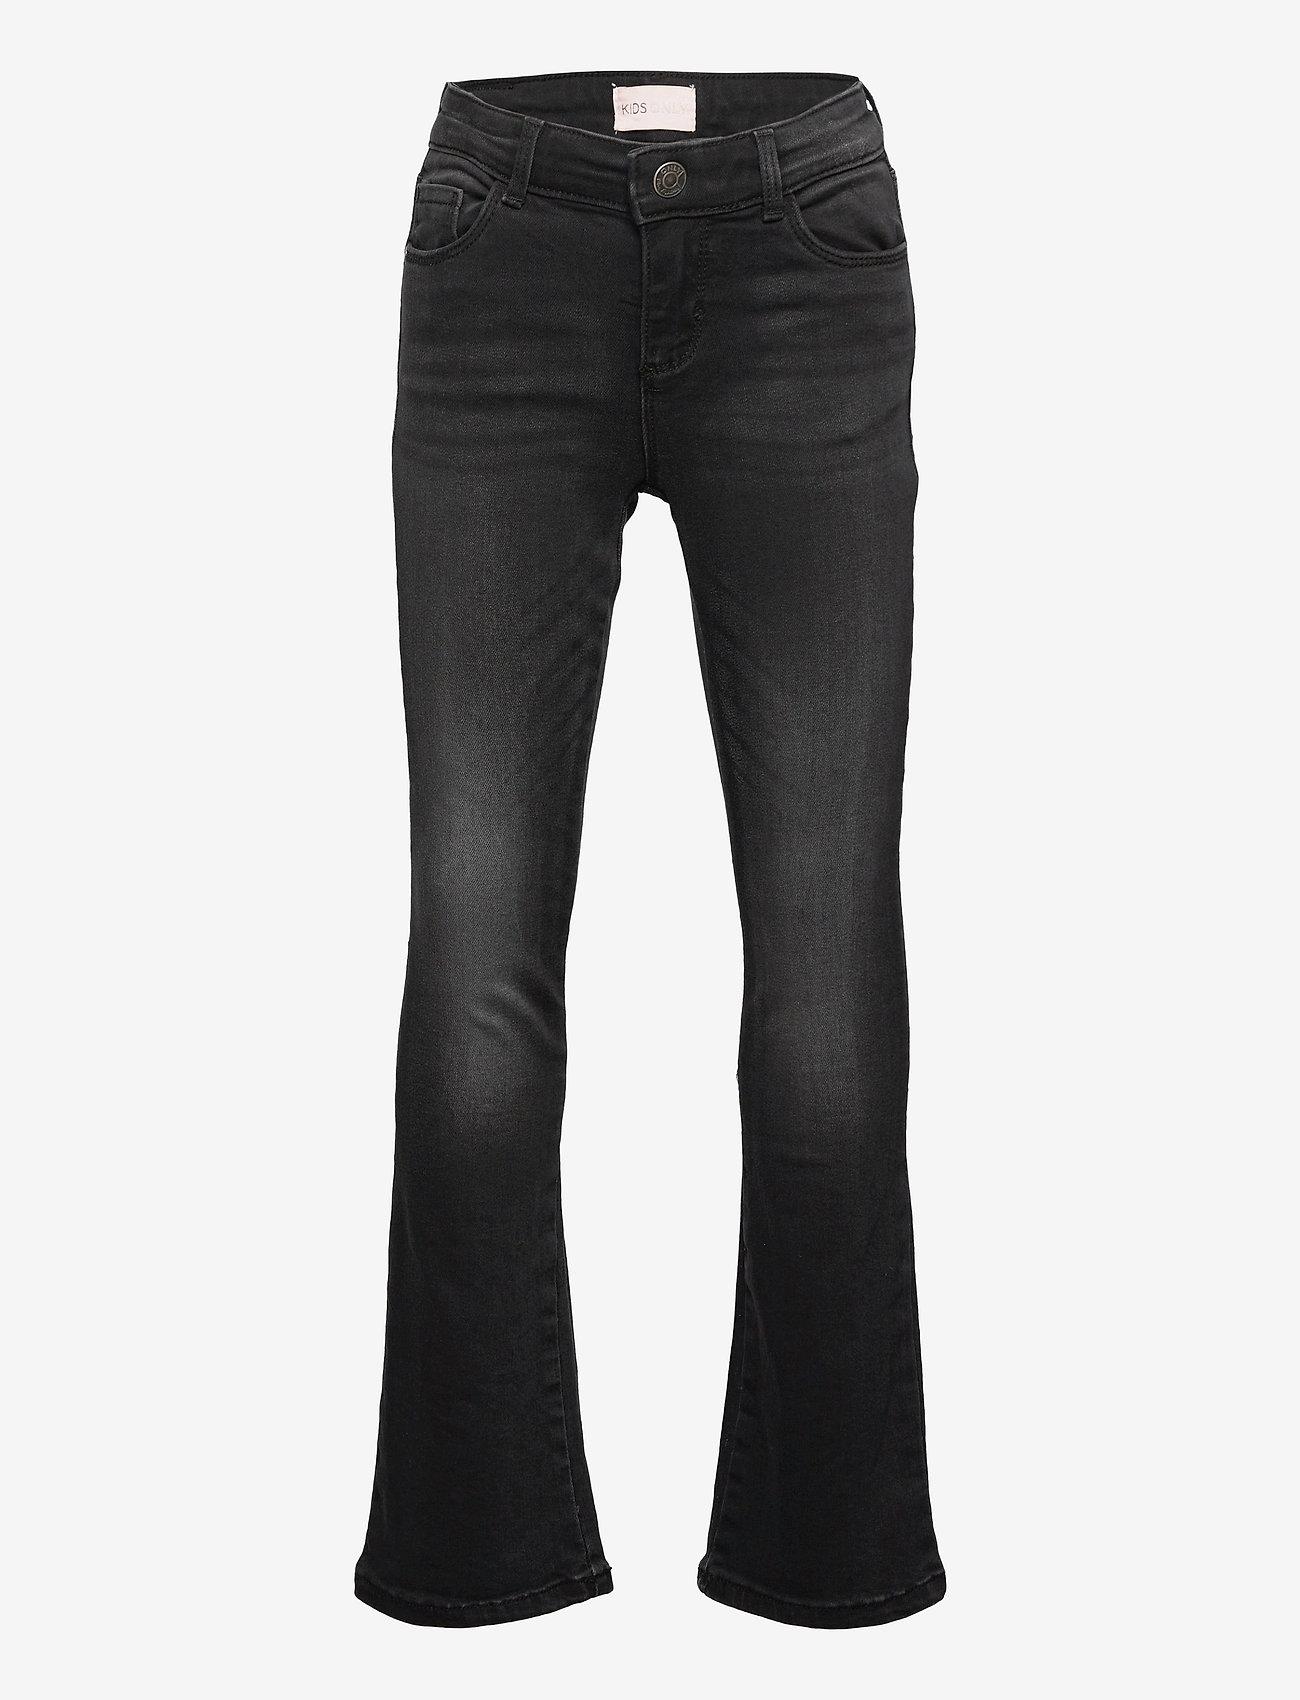 Kids Only - KONLINN FLARED DARK GREY DNM JEANS  AZG - jeans - dark grey denim - 0